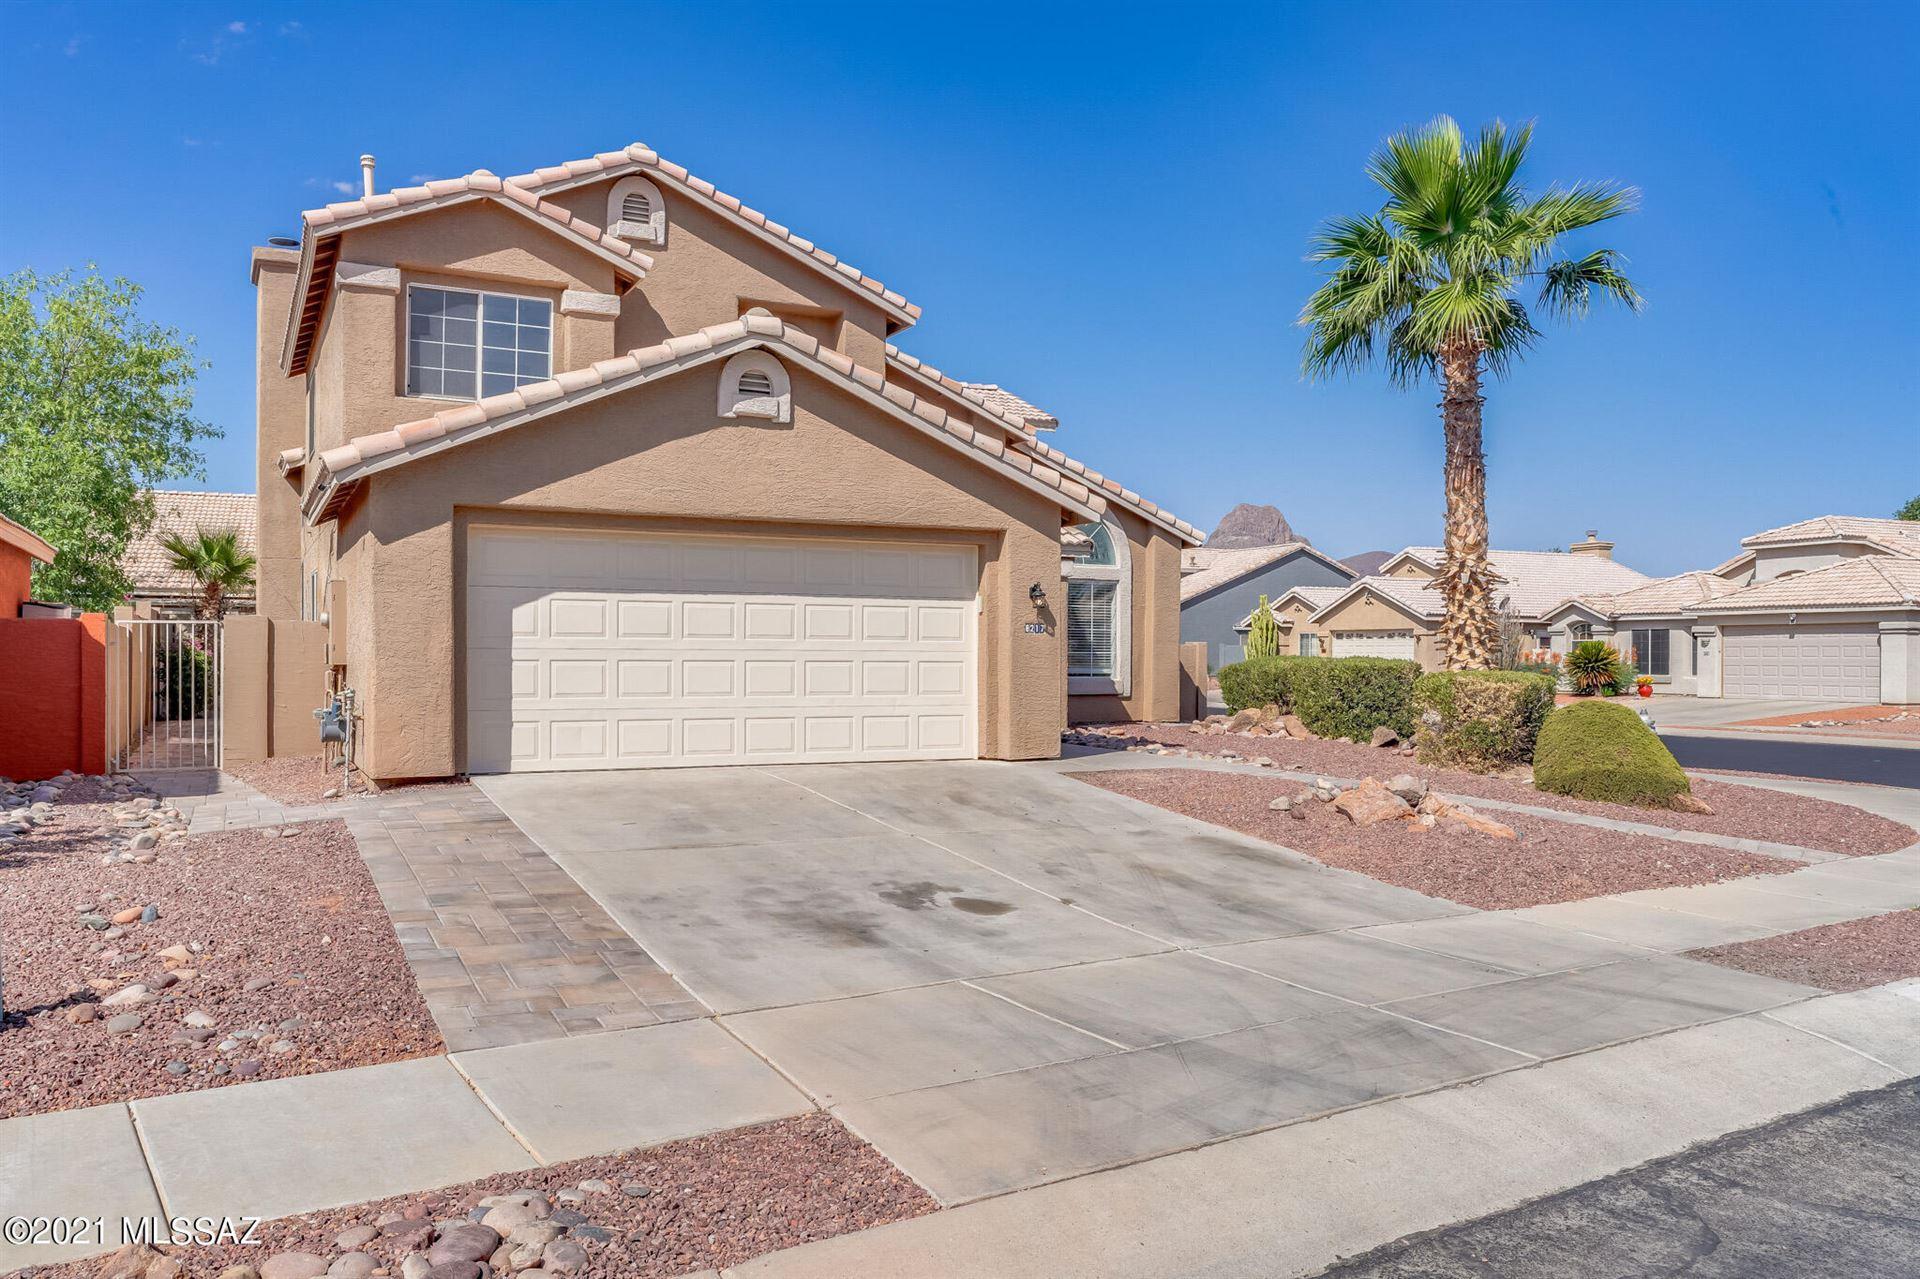 8217 N Torrey Place, Tucson, AZ 85743 - MLS#: 22114688